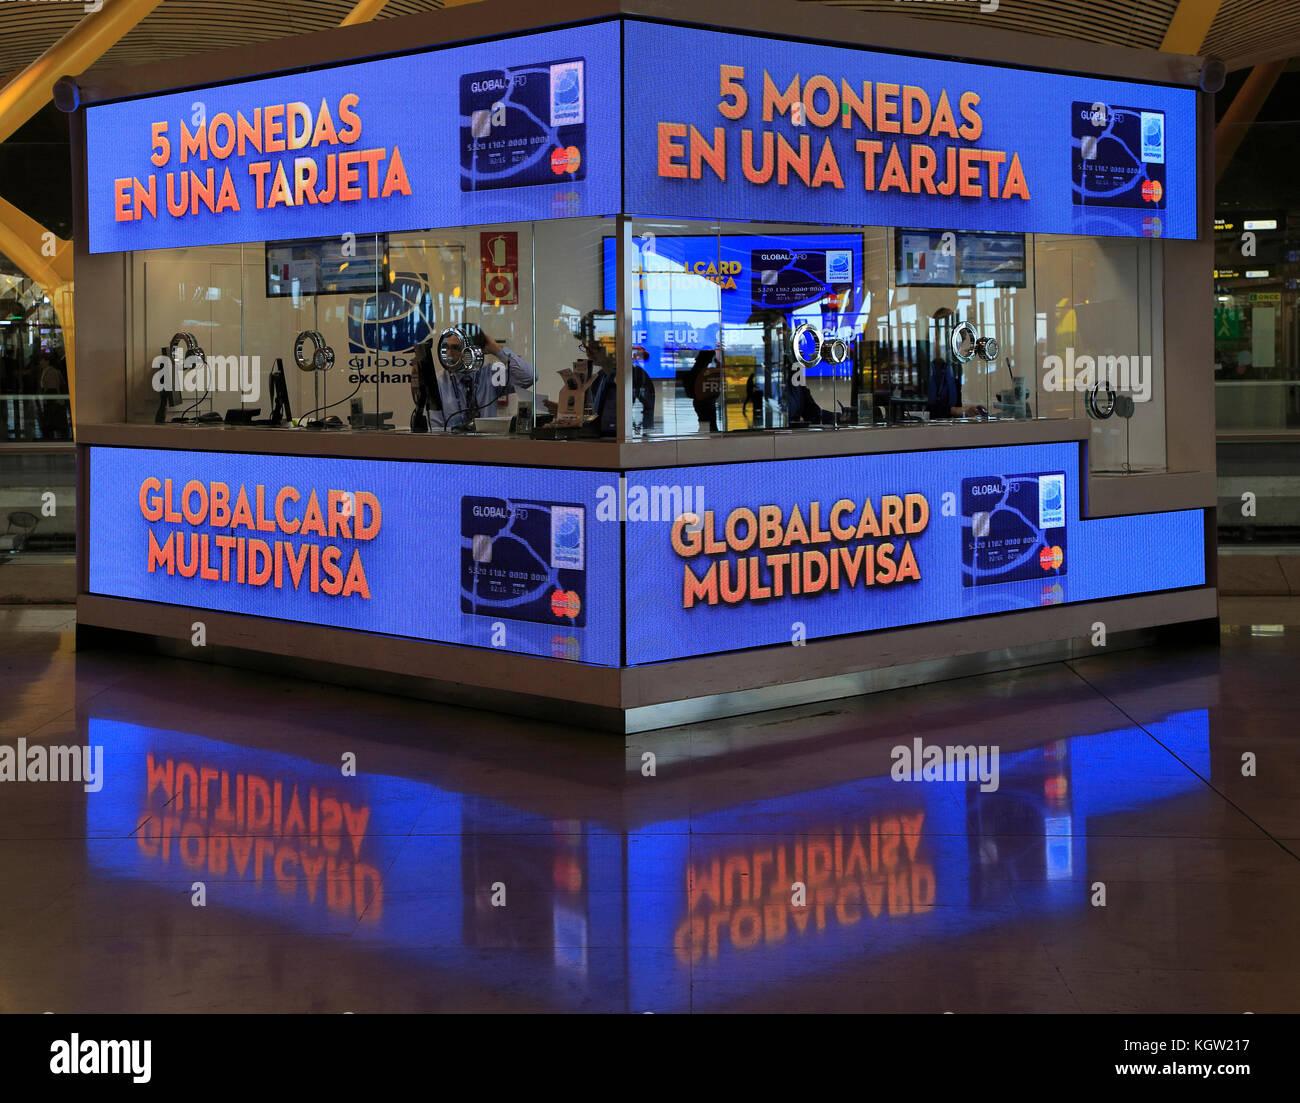 money exchange booth office cambio bureau de change terminal 4 madrid airport spain